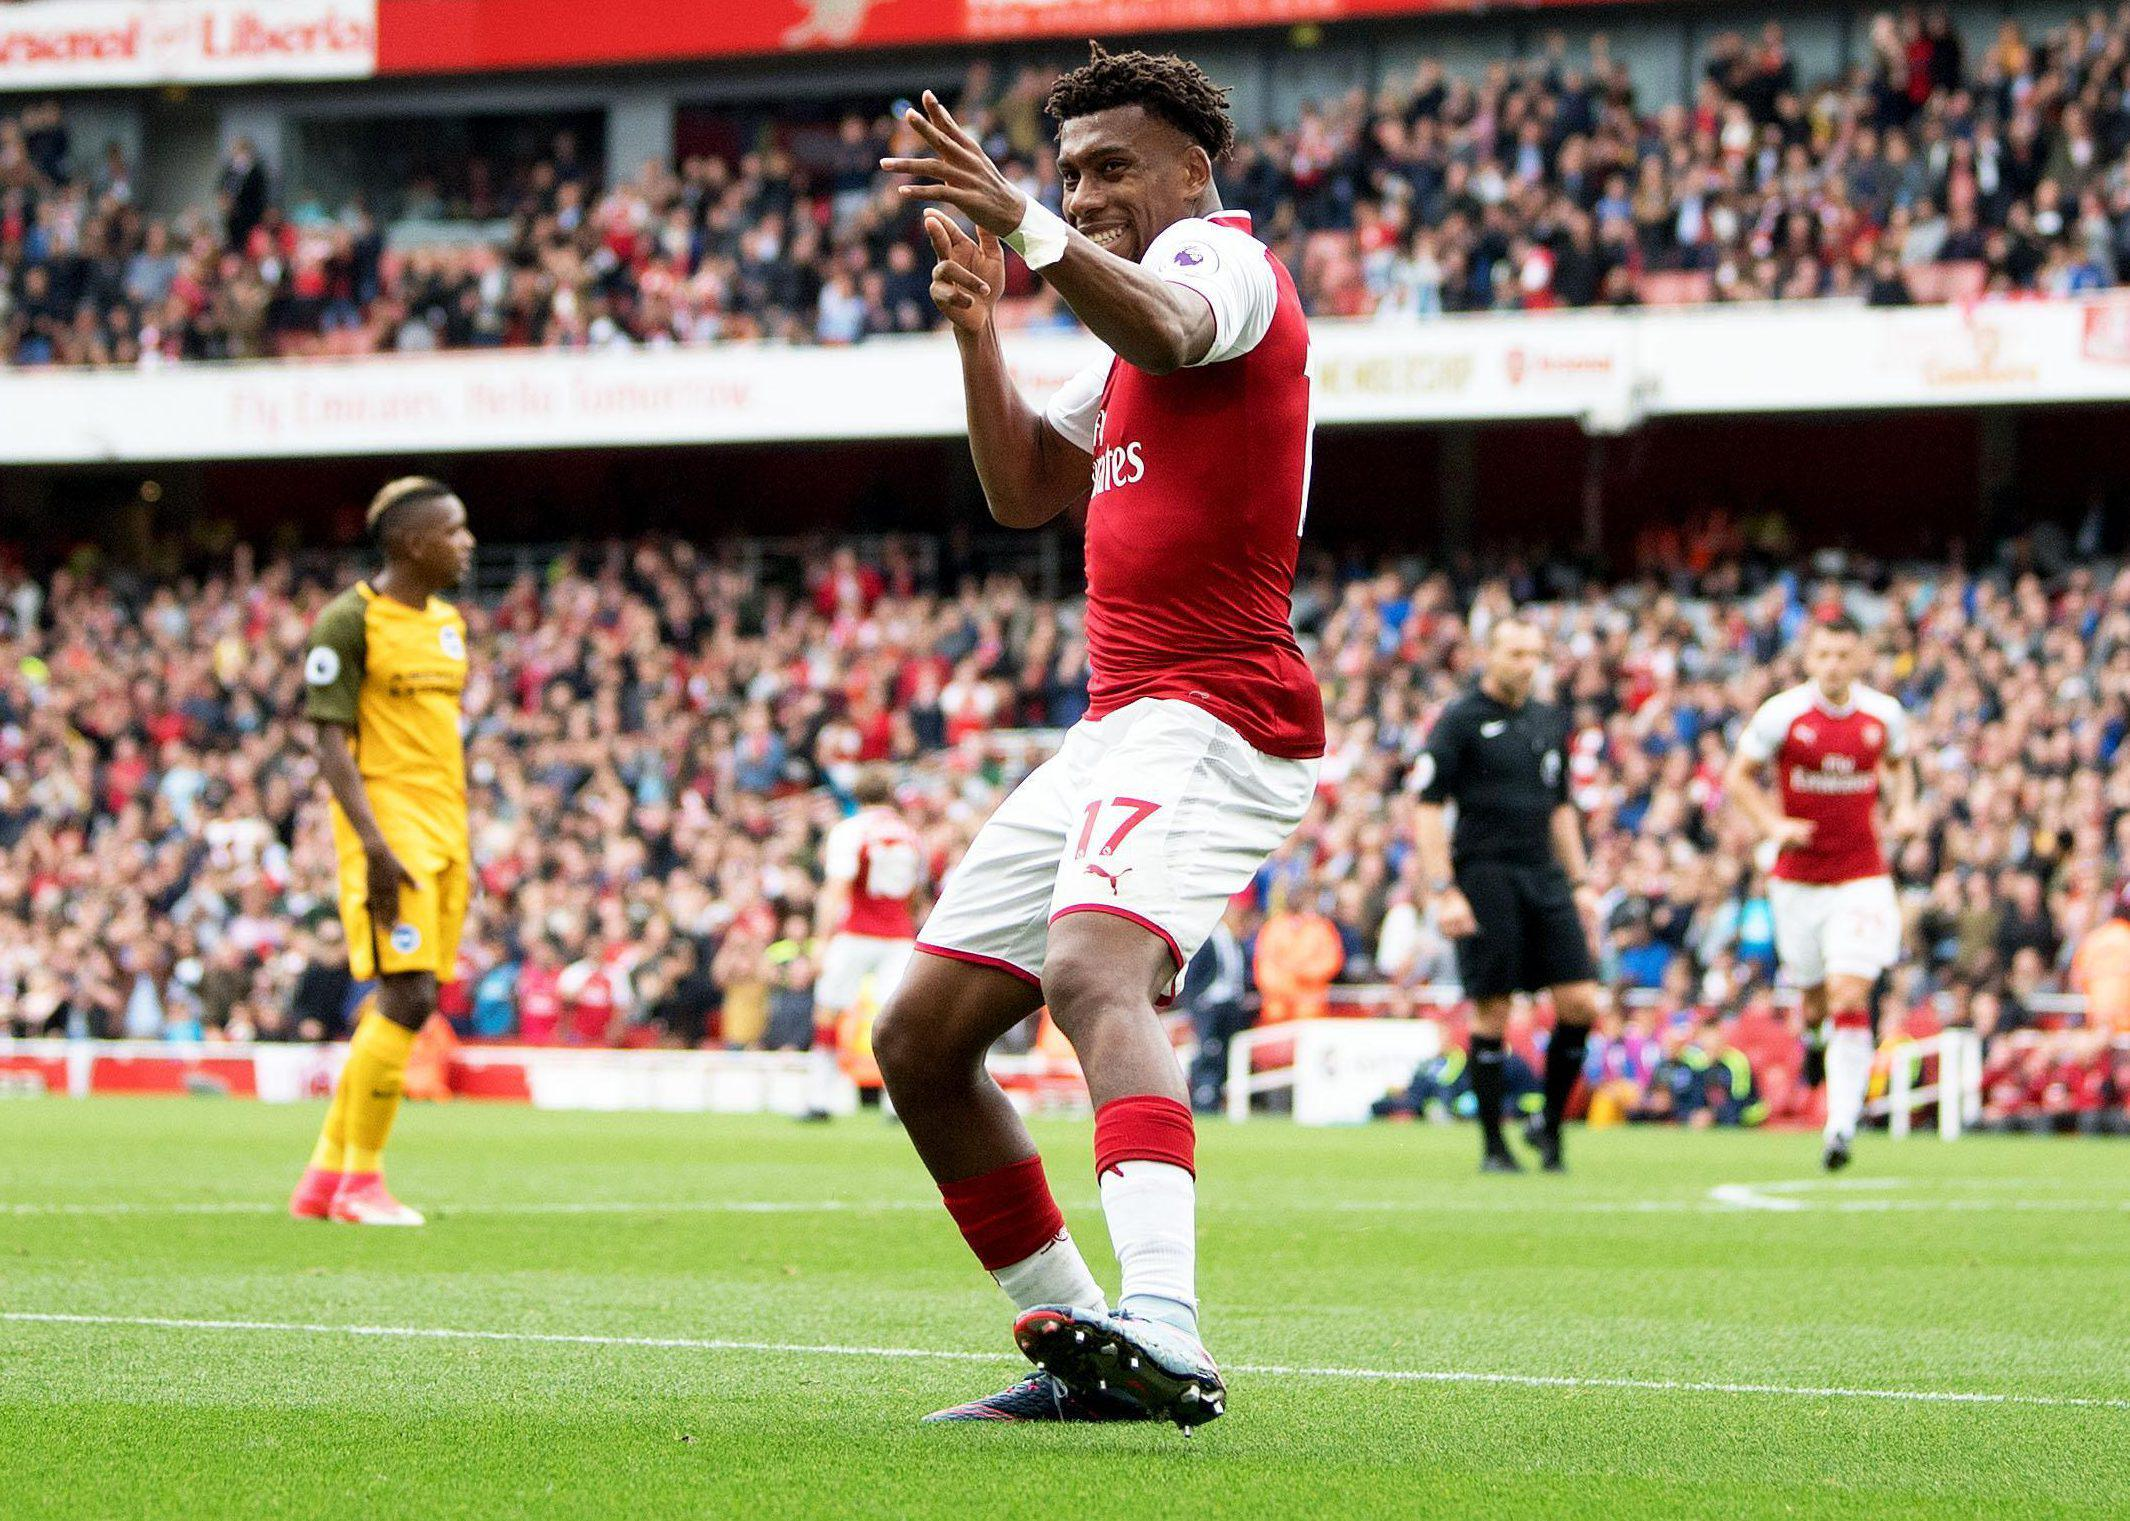 Iwobi scored a brilliant goal against Brighton